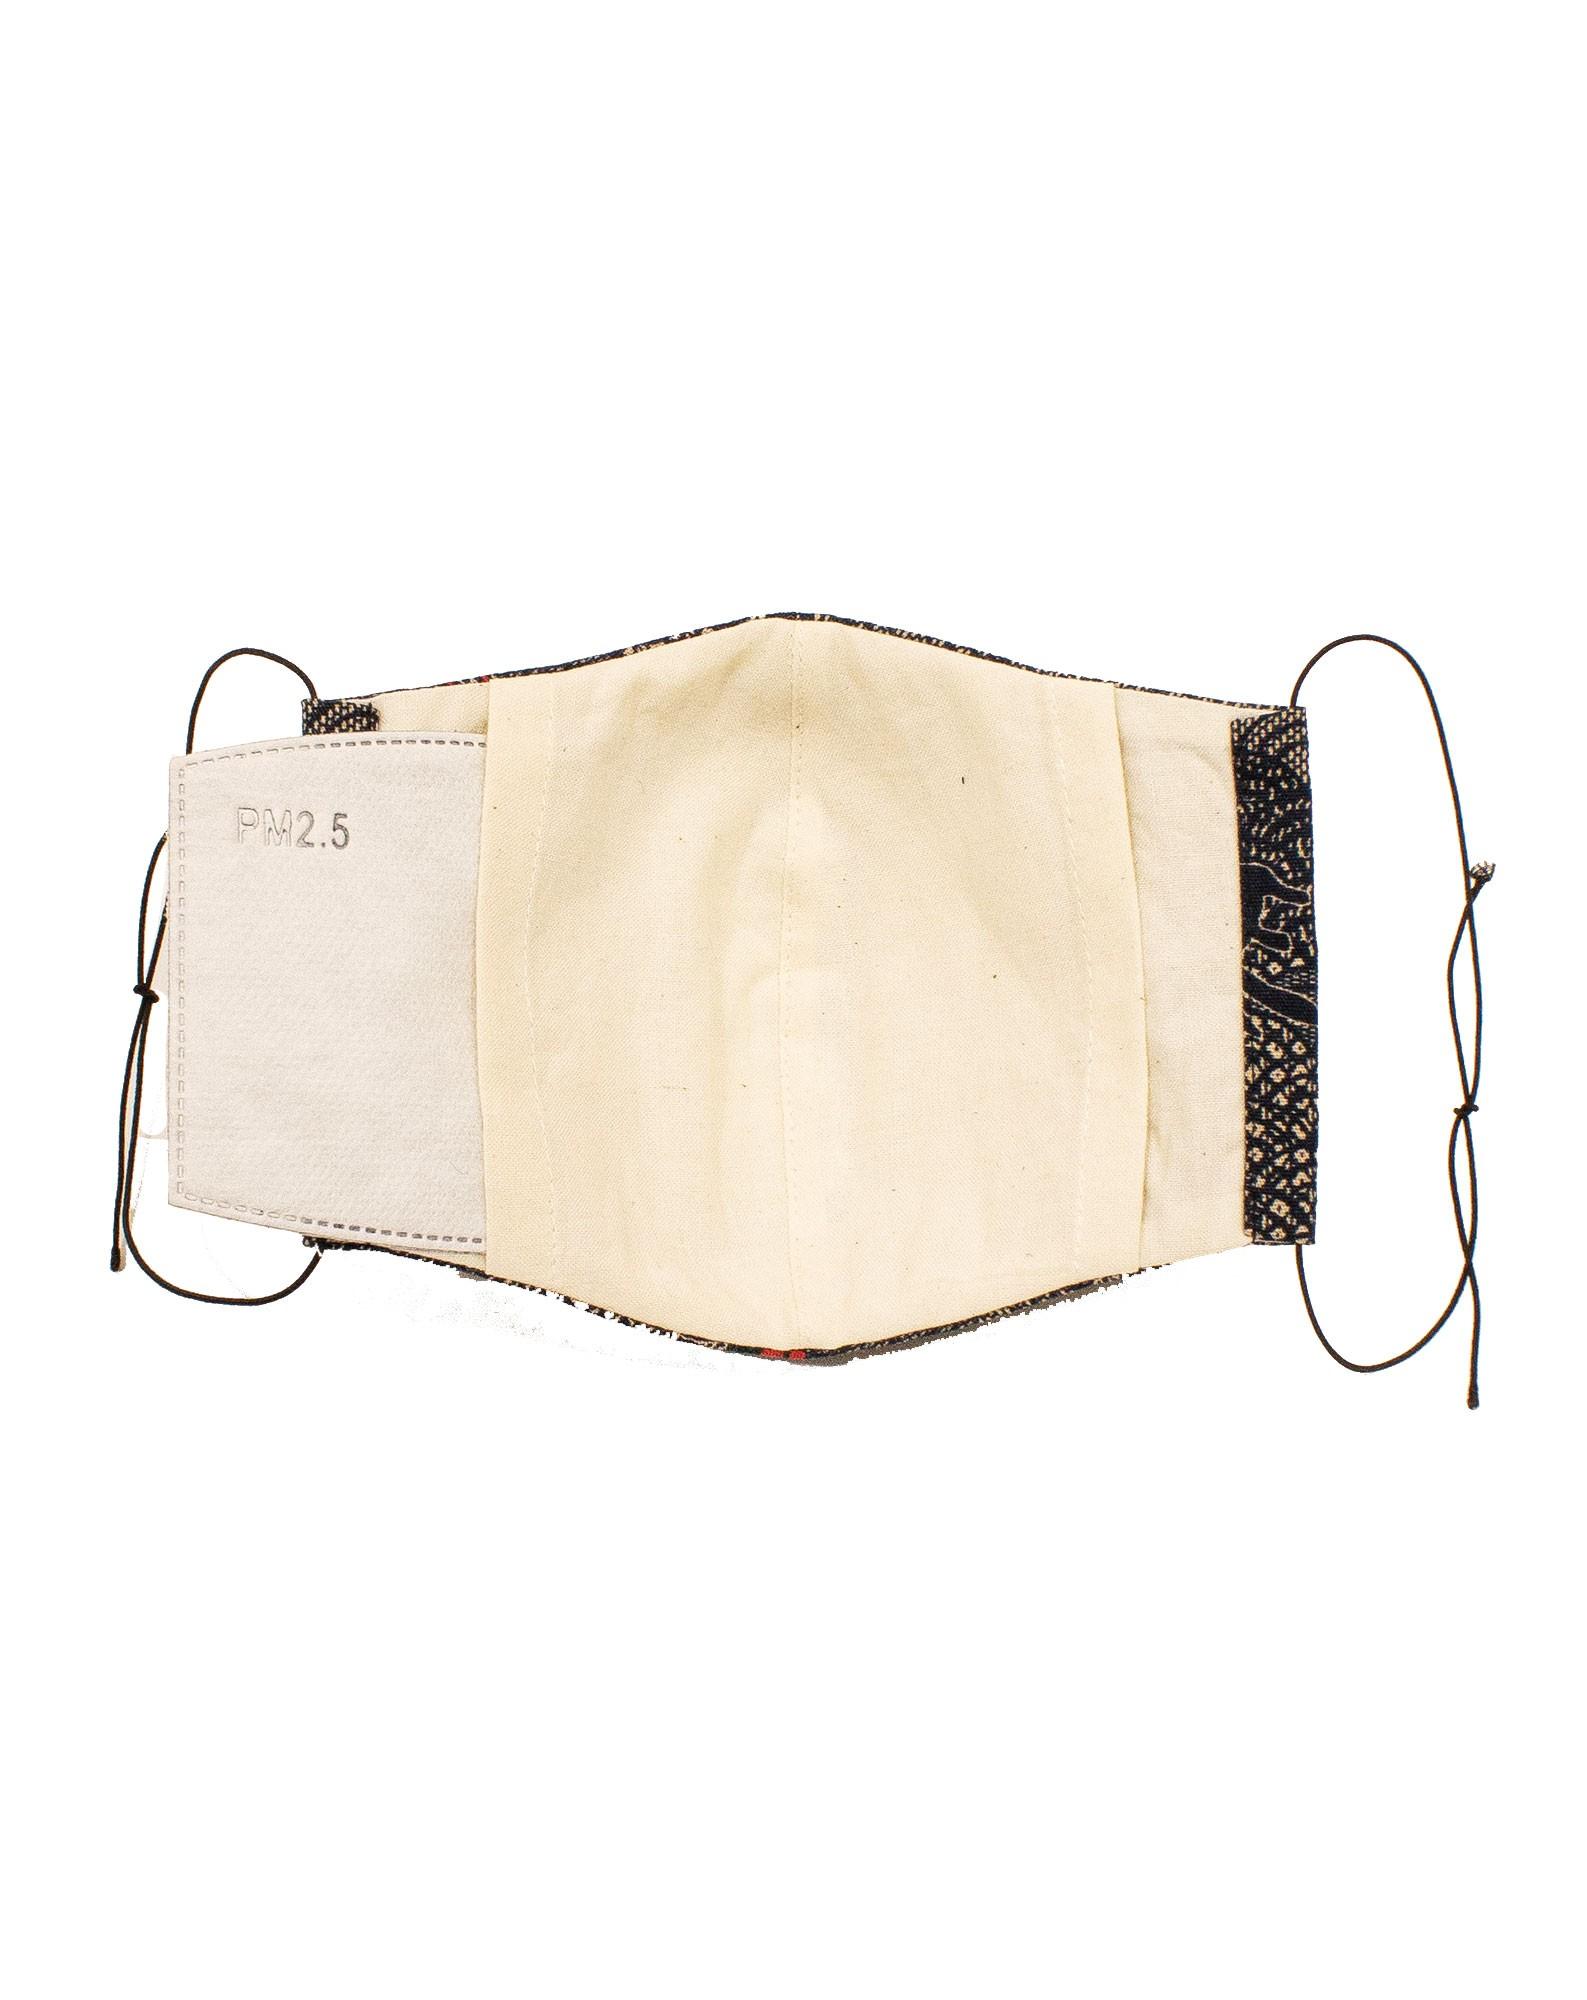 Mask with filter pocket - Kamon